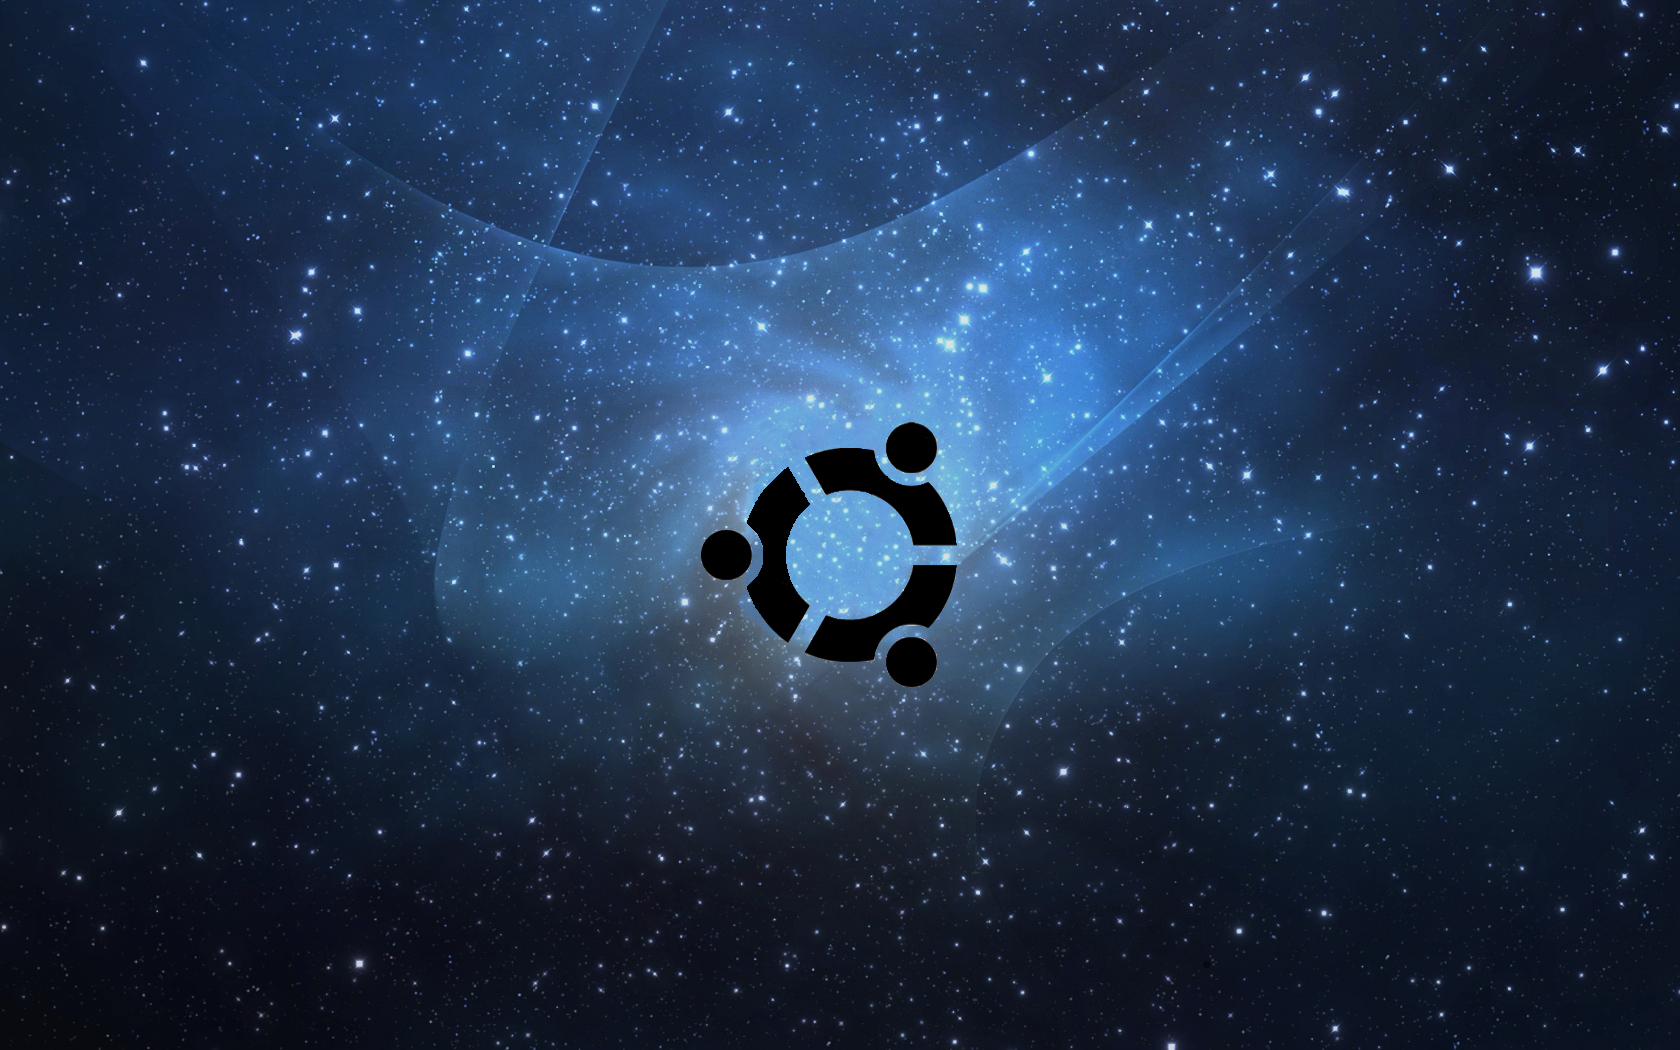 Ubuntu Space by oma-hunter